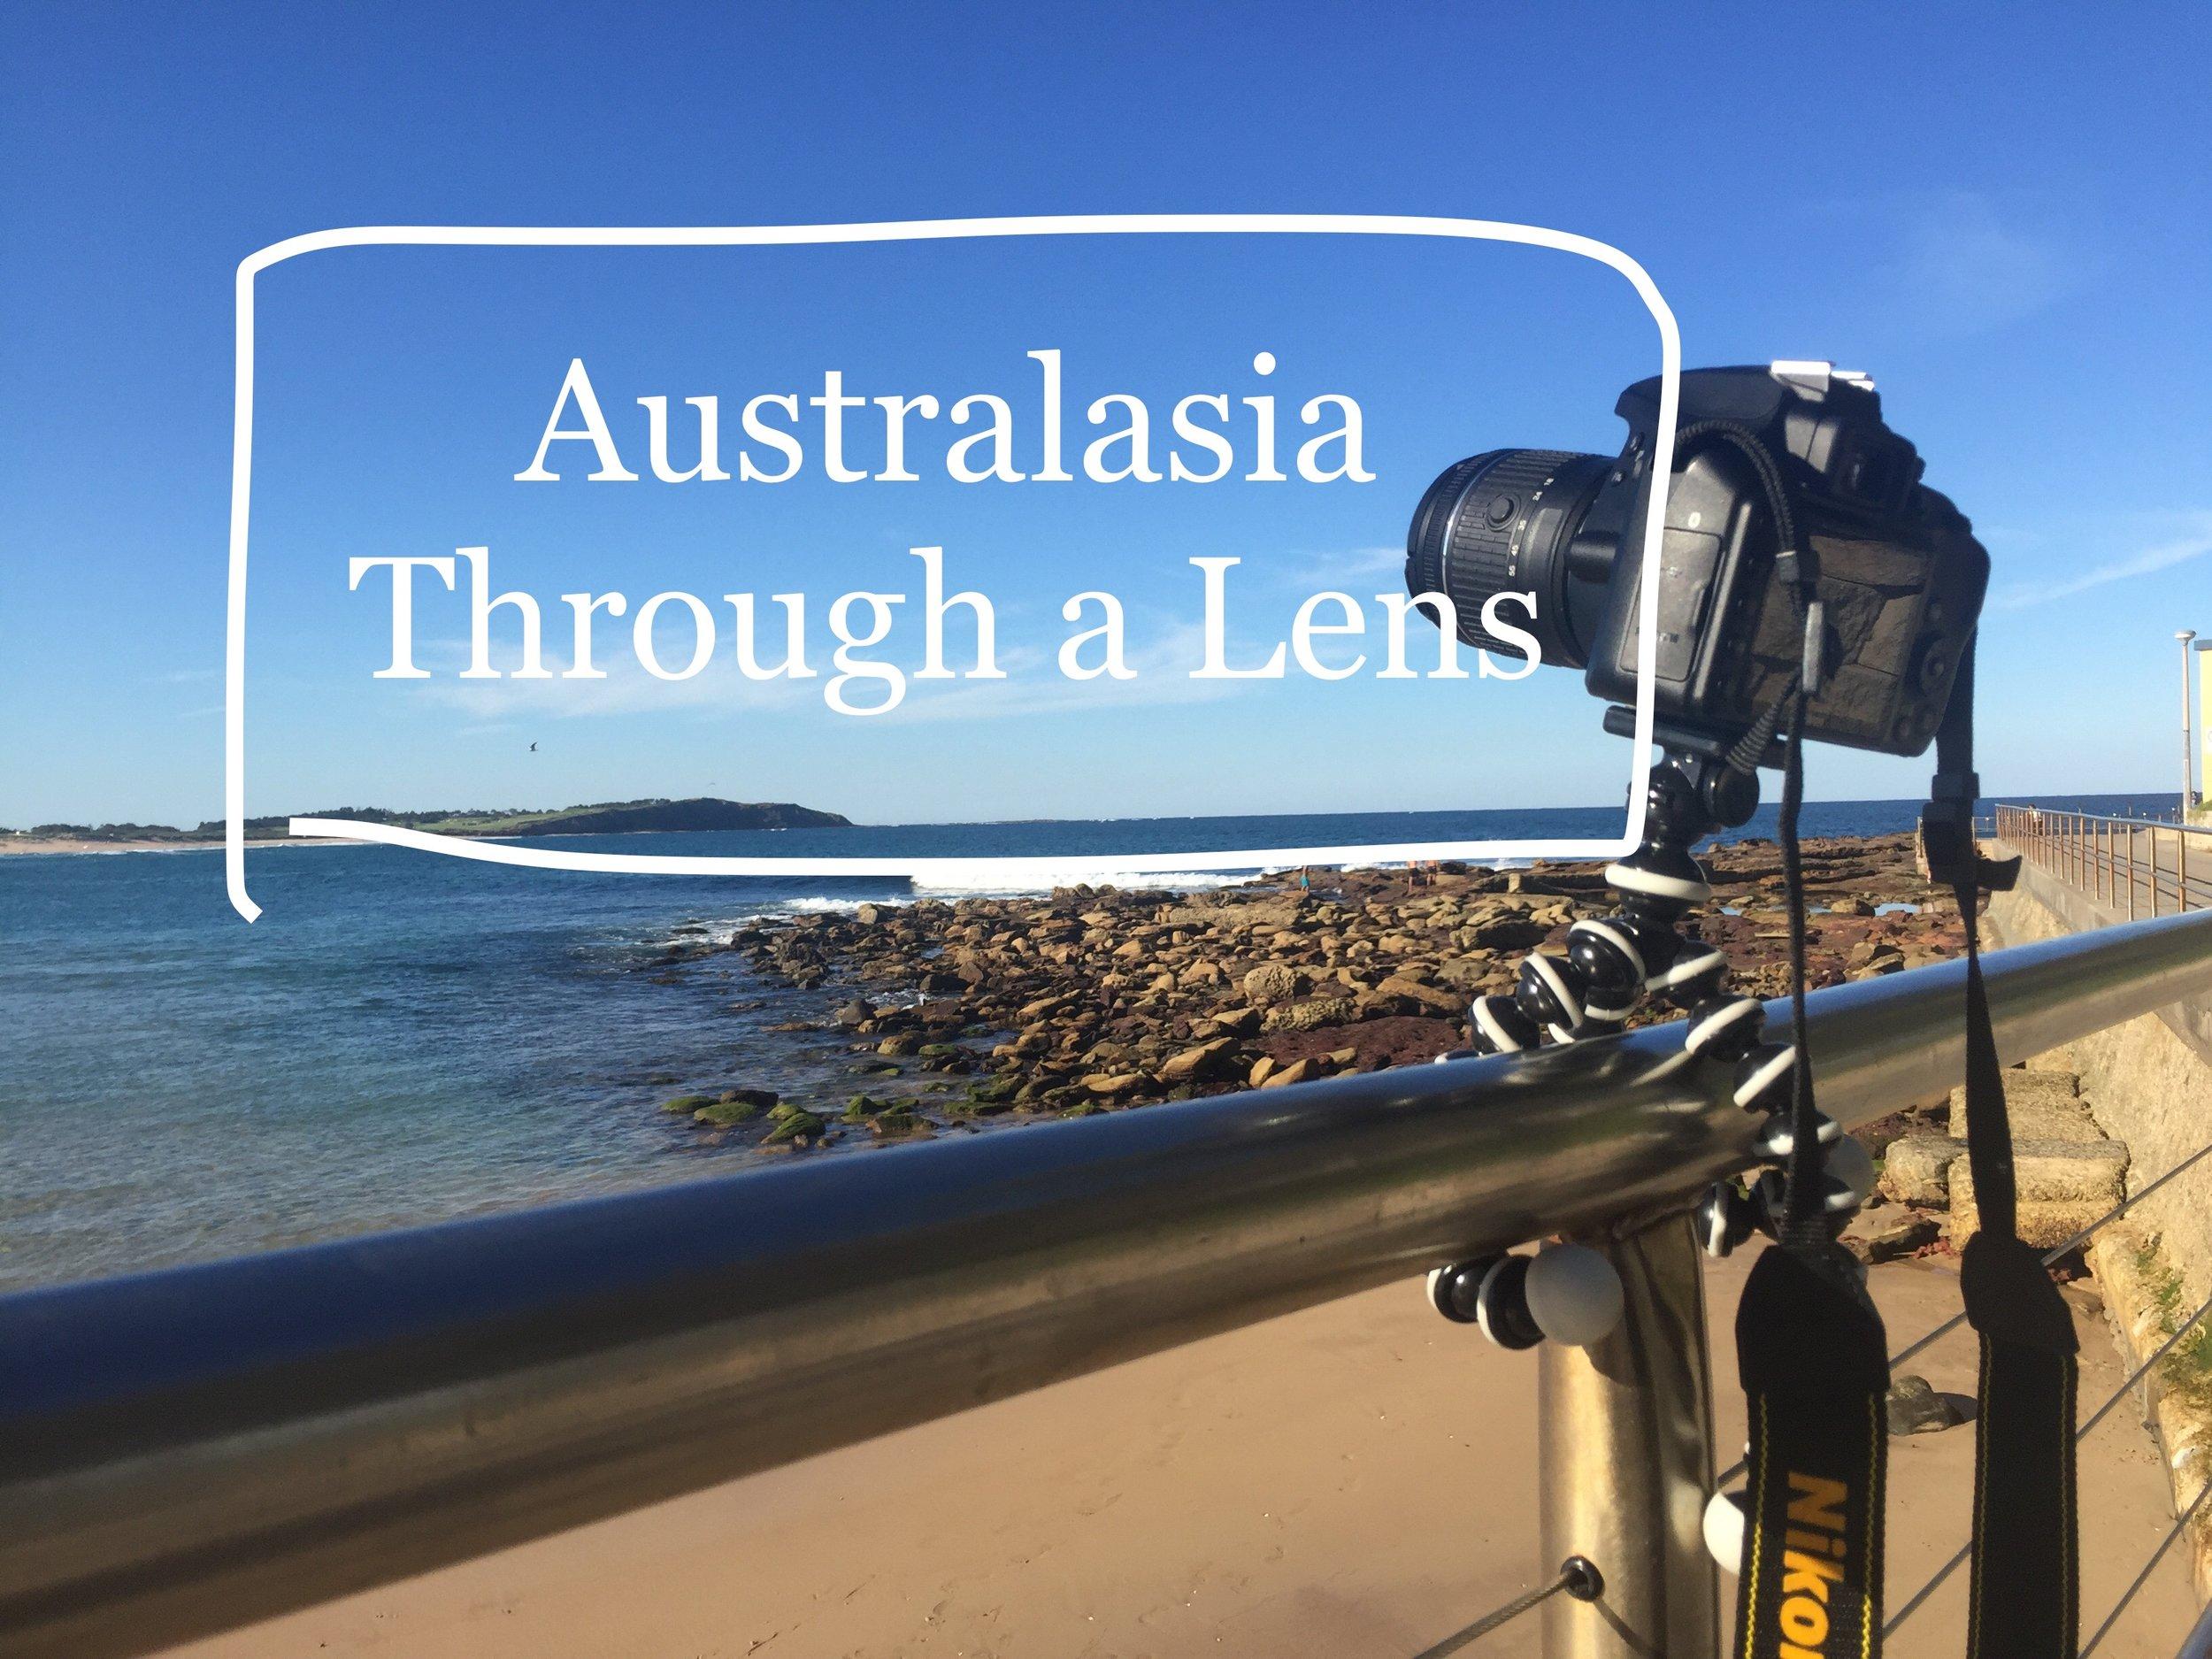 AustralasiaCamera.jpg